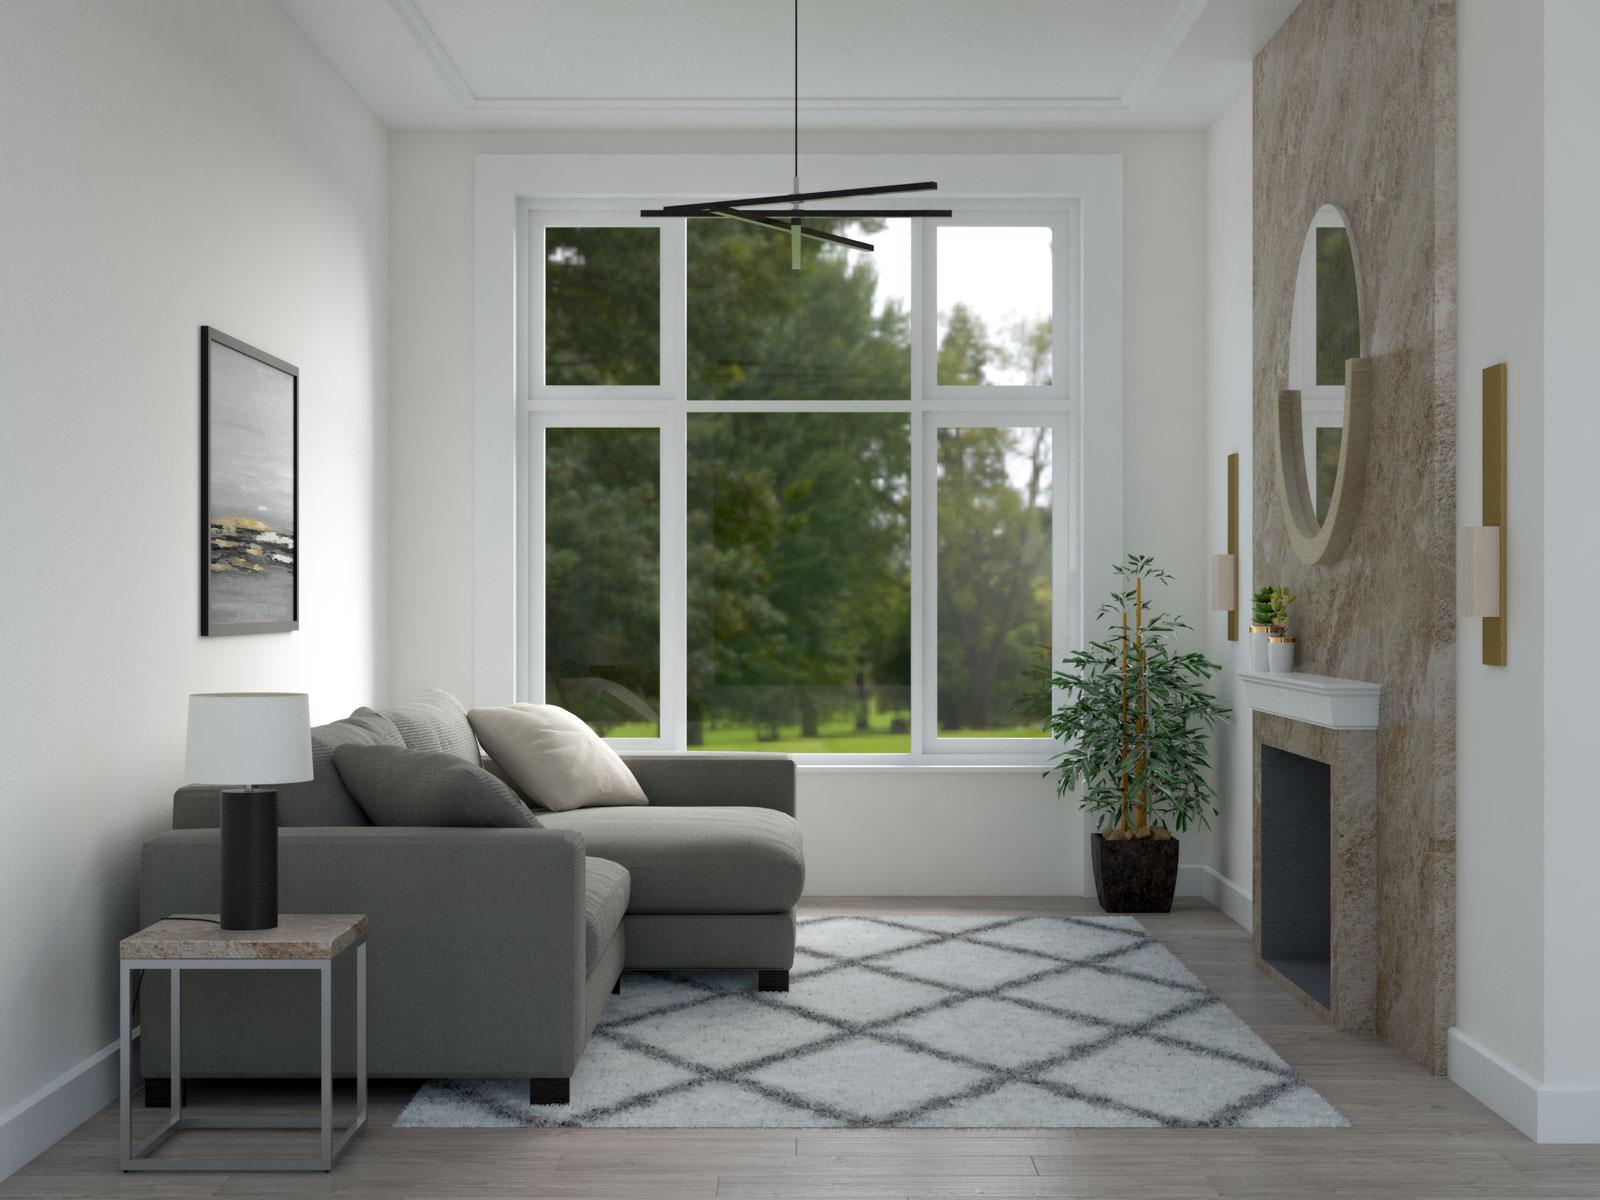 Diamond rug in small living room